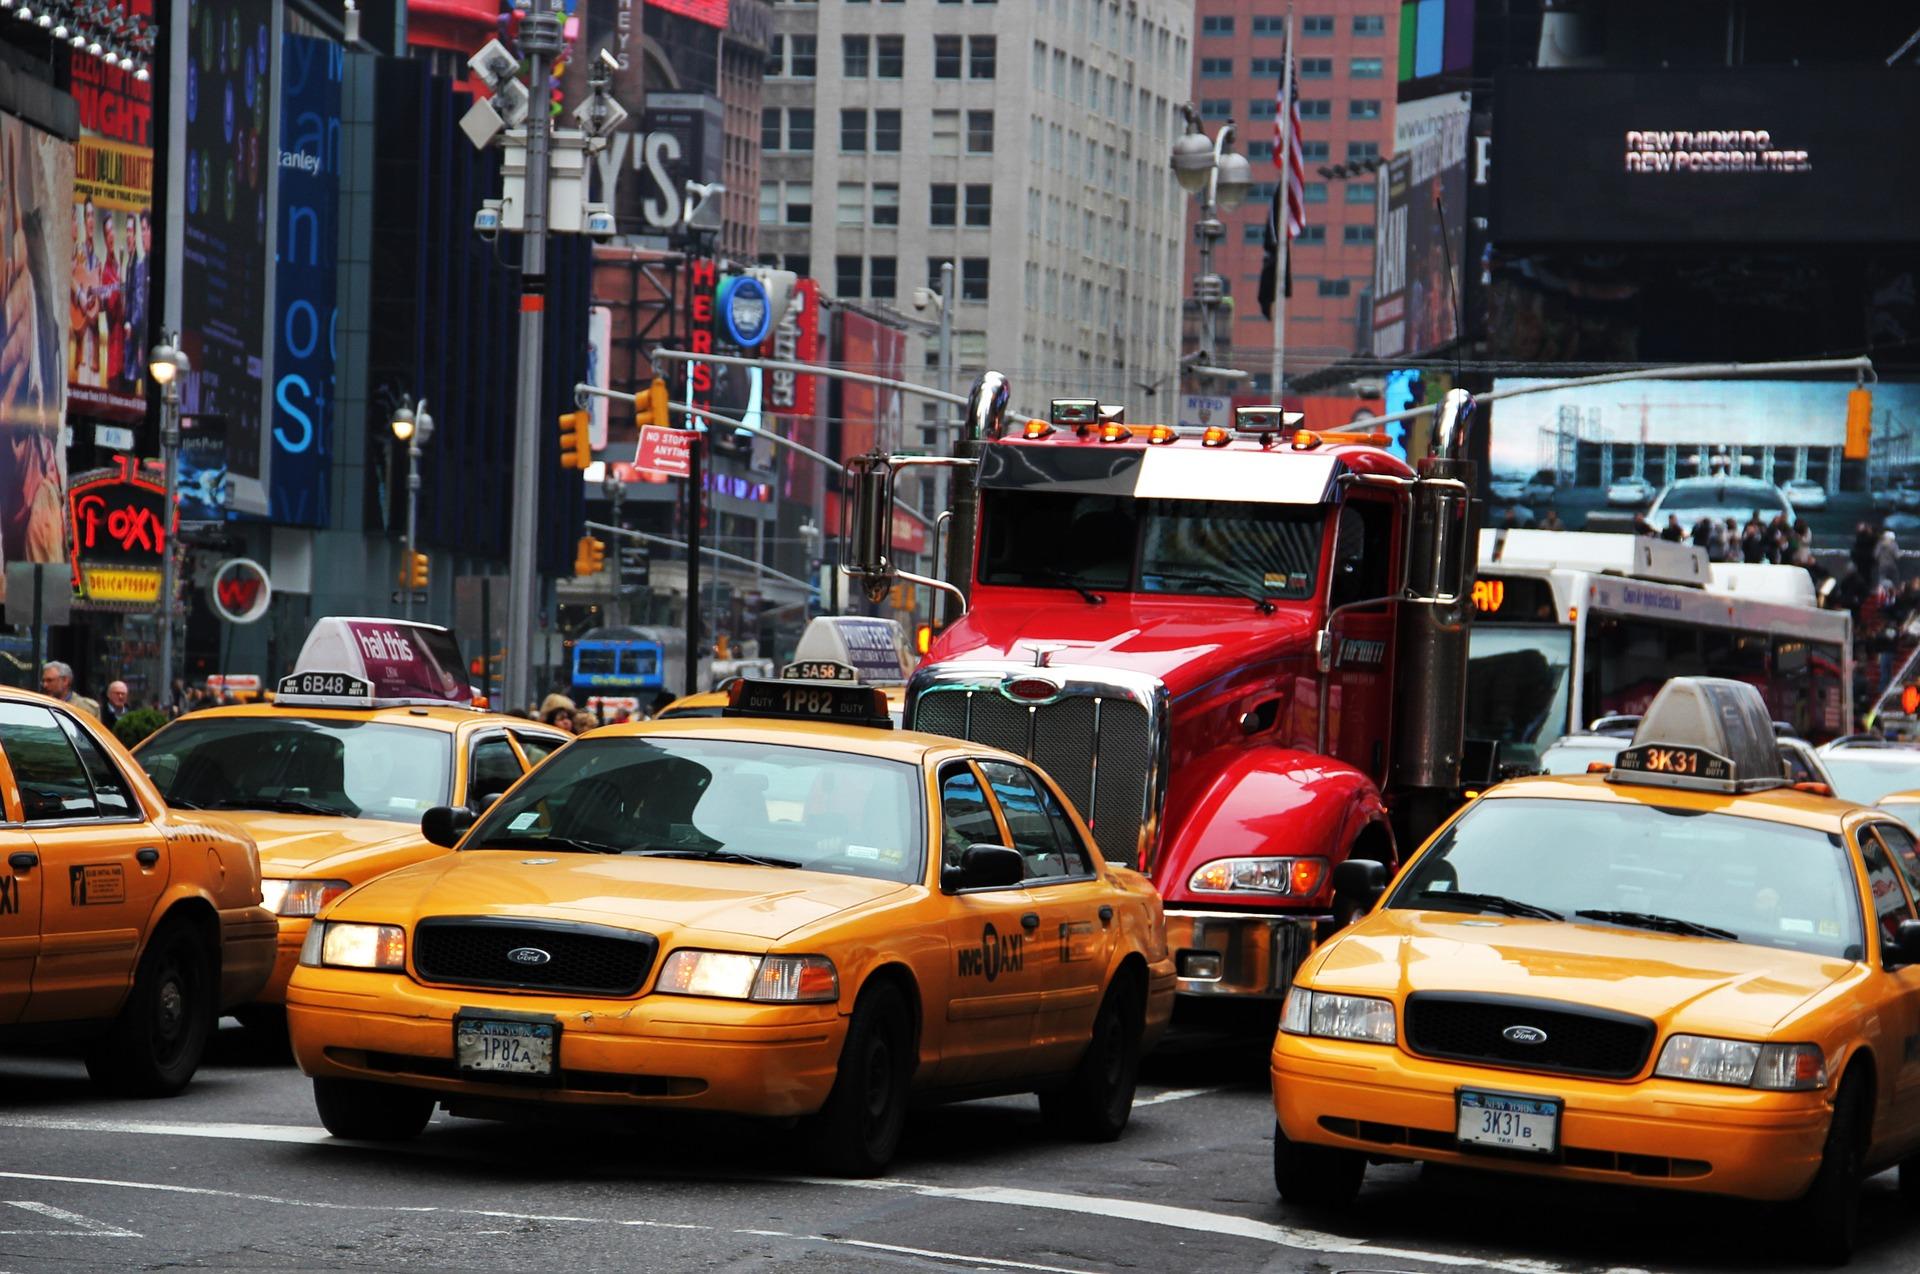 new-york-times-square-1132544_1920.jpg